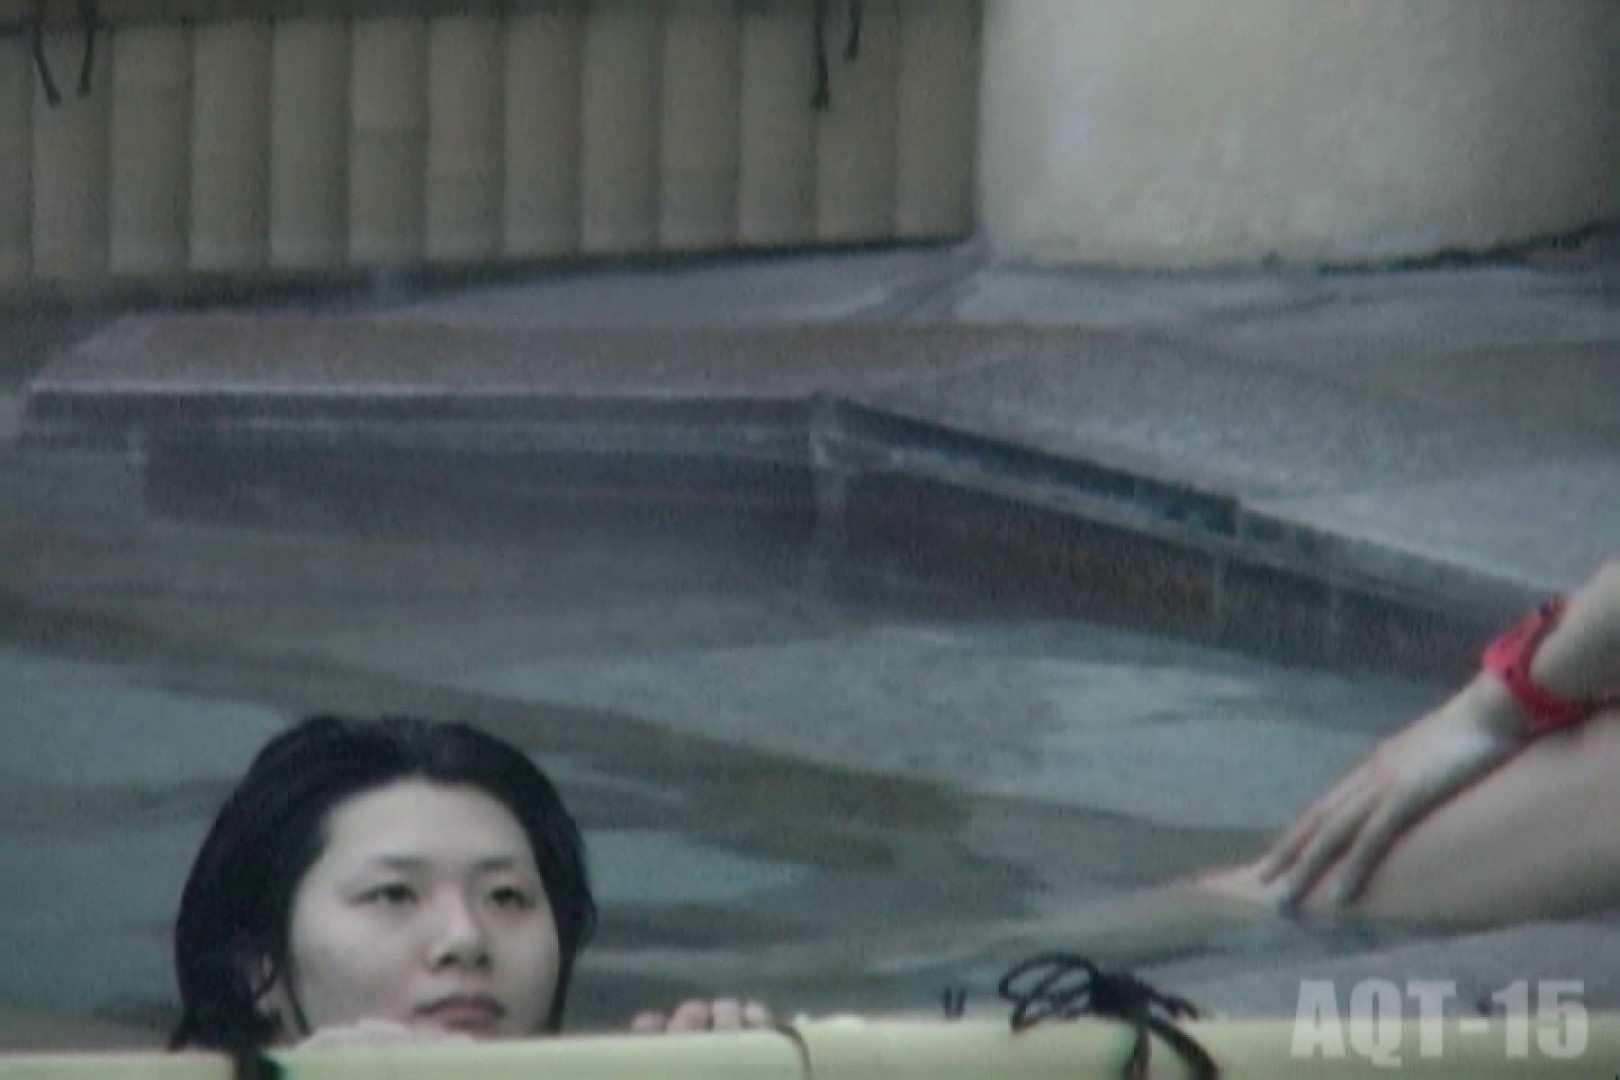 Aquaな露天風呂Vol.837 エッチな盗撮 エロ無料画像 103pic 53